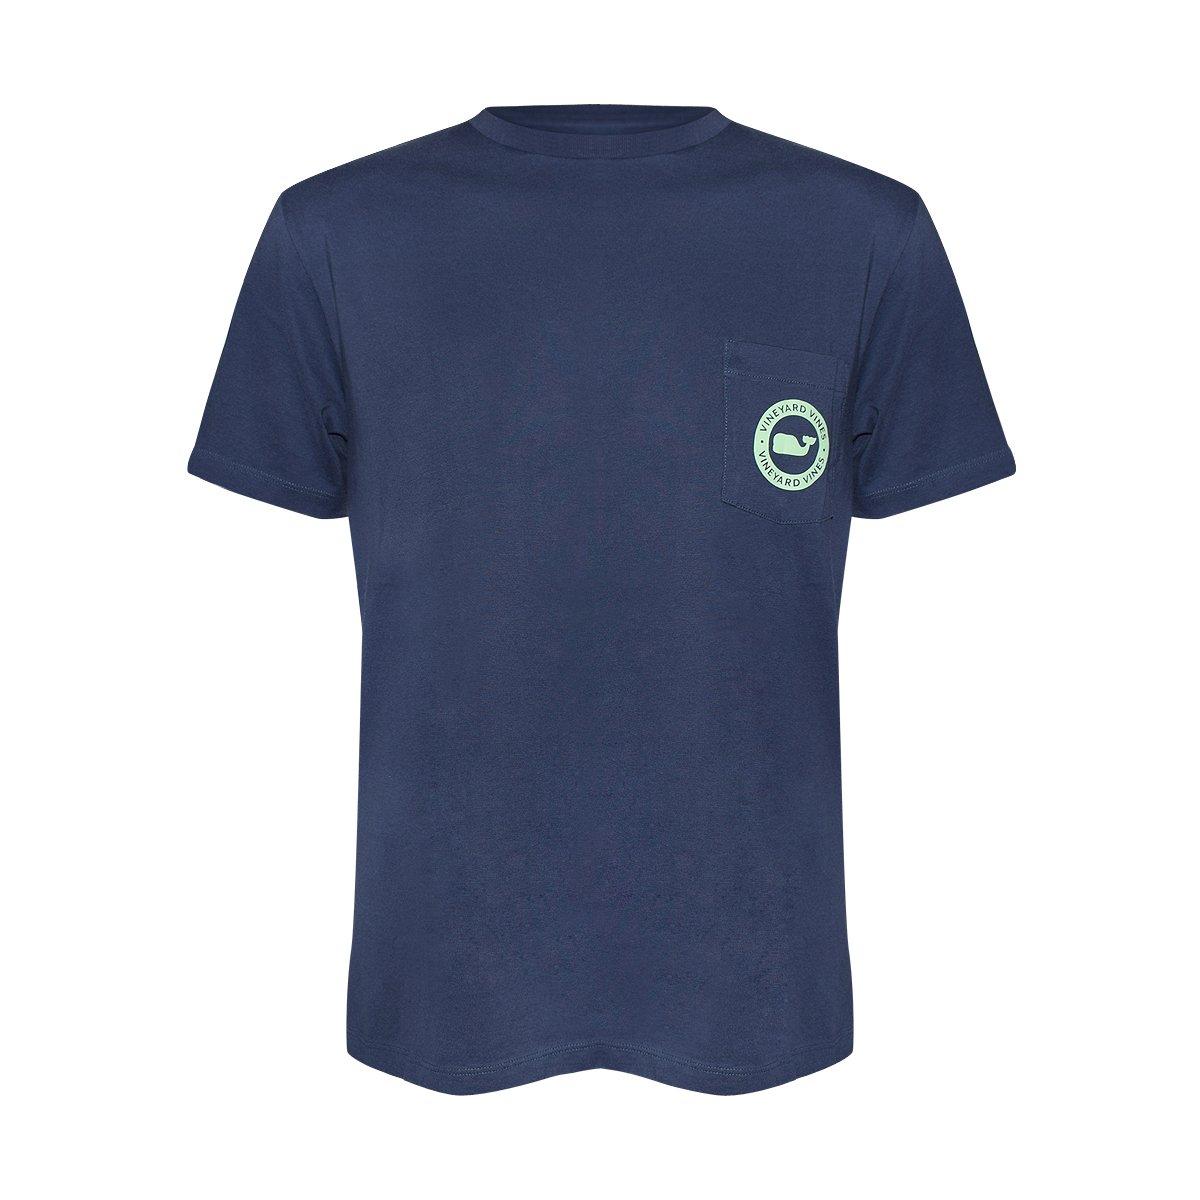 Vineyard Vinesメンズ半袖City Whale Teeシャツ B07588LRFN Small|Blue Blazer/Whale Dot Blue Blazer/Whale Dot Small